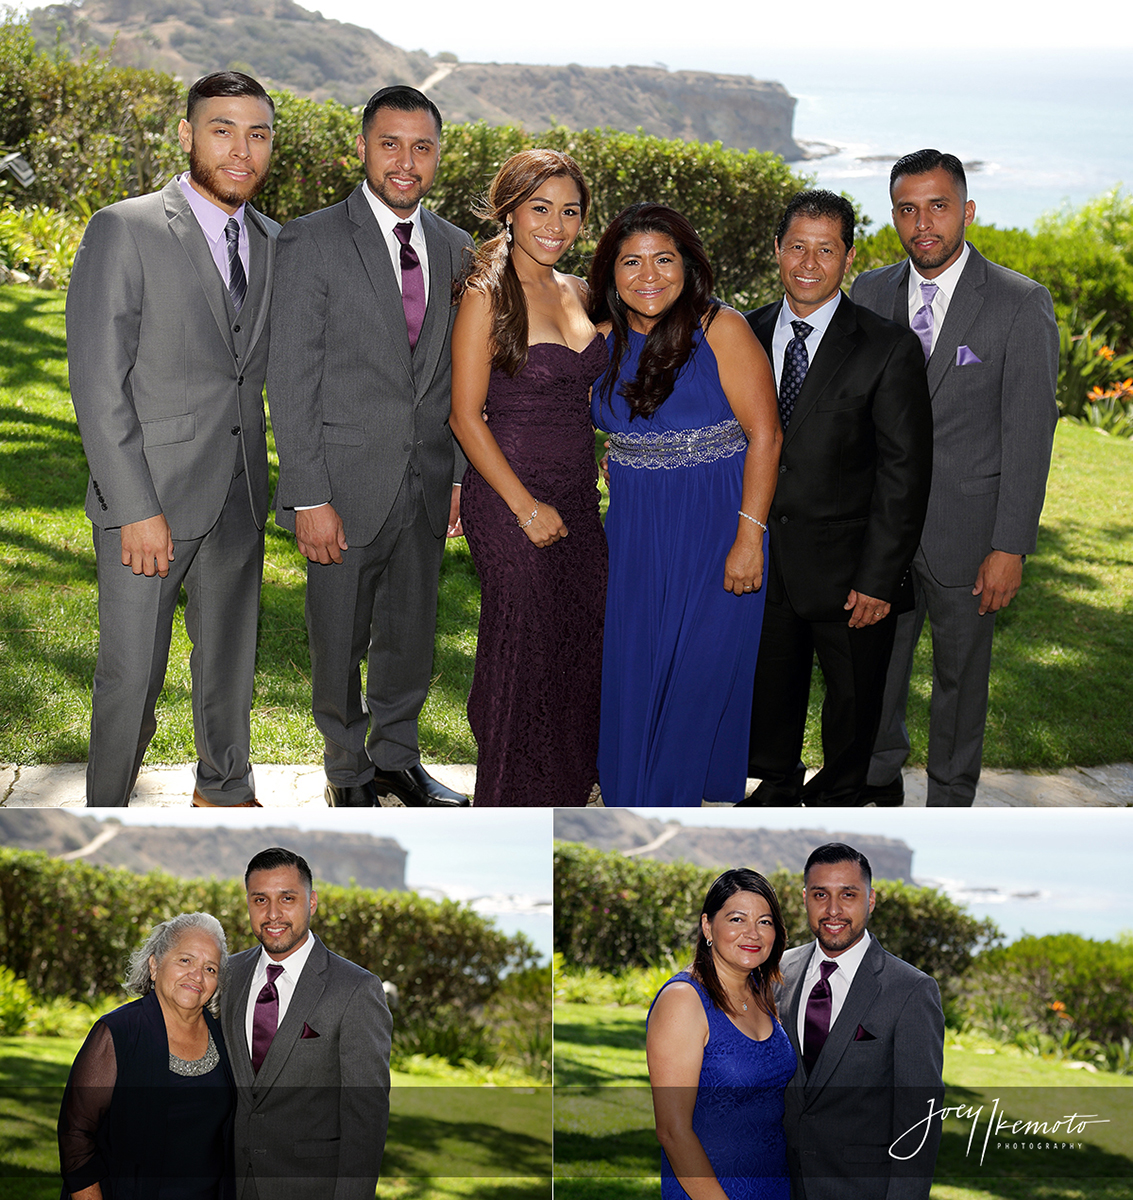 wayfarers-chapel-palos-verdes-and-micheals-tuscany-room-san-pedro-wedding_0005_blog-collage-1476317023745